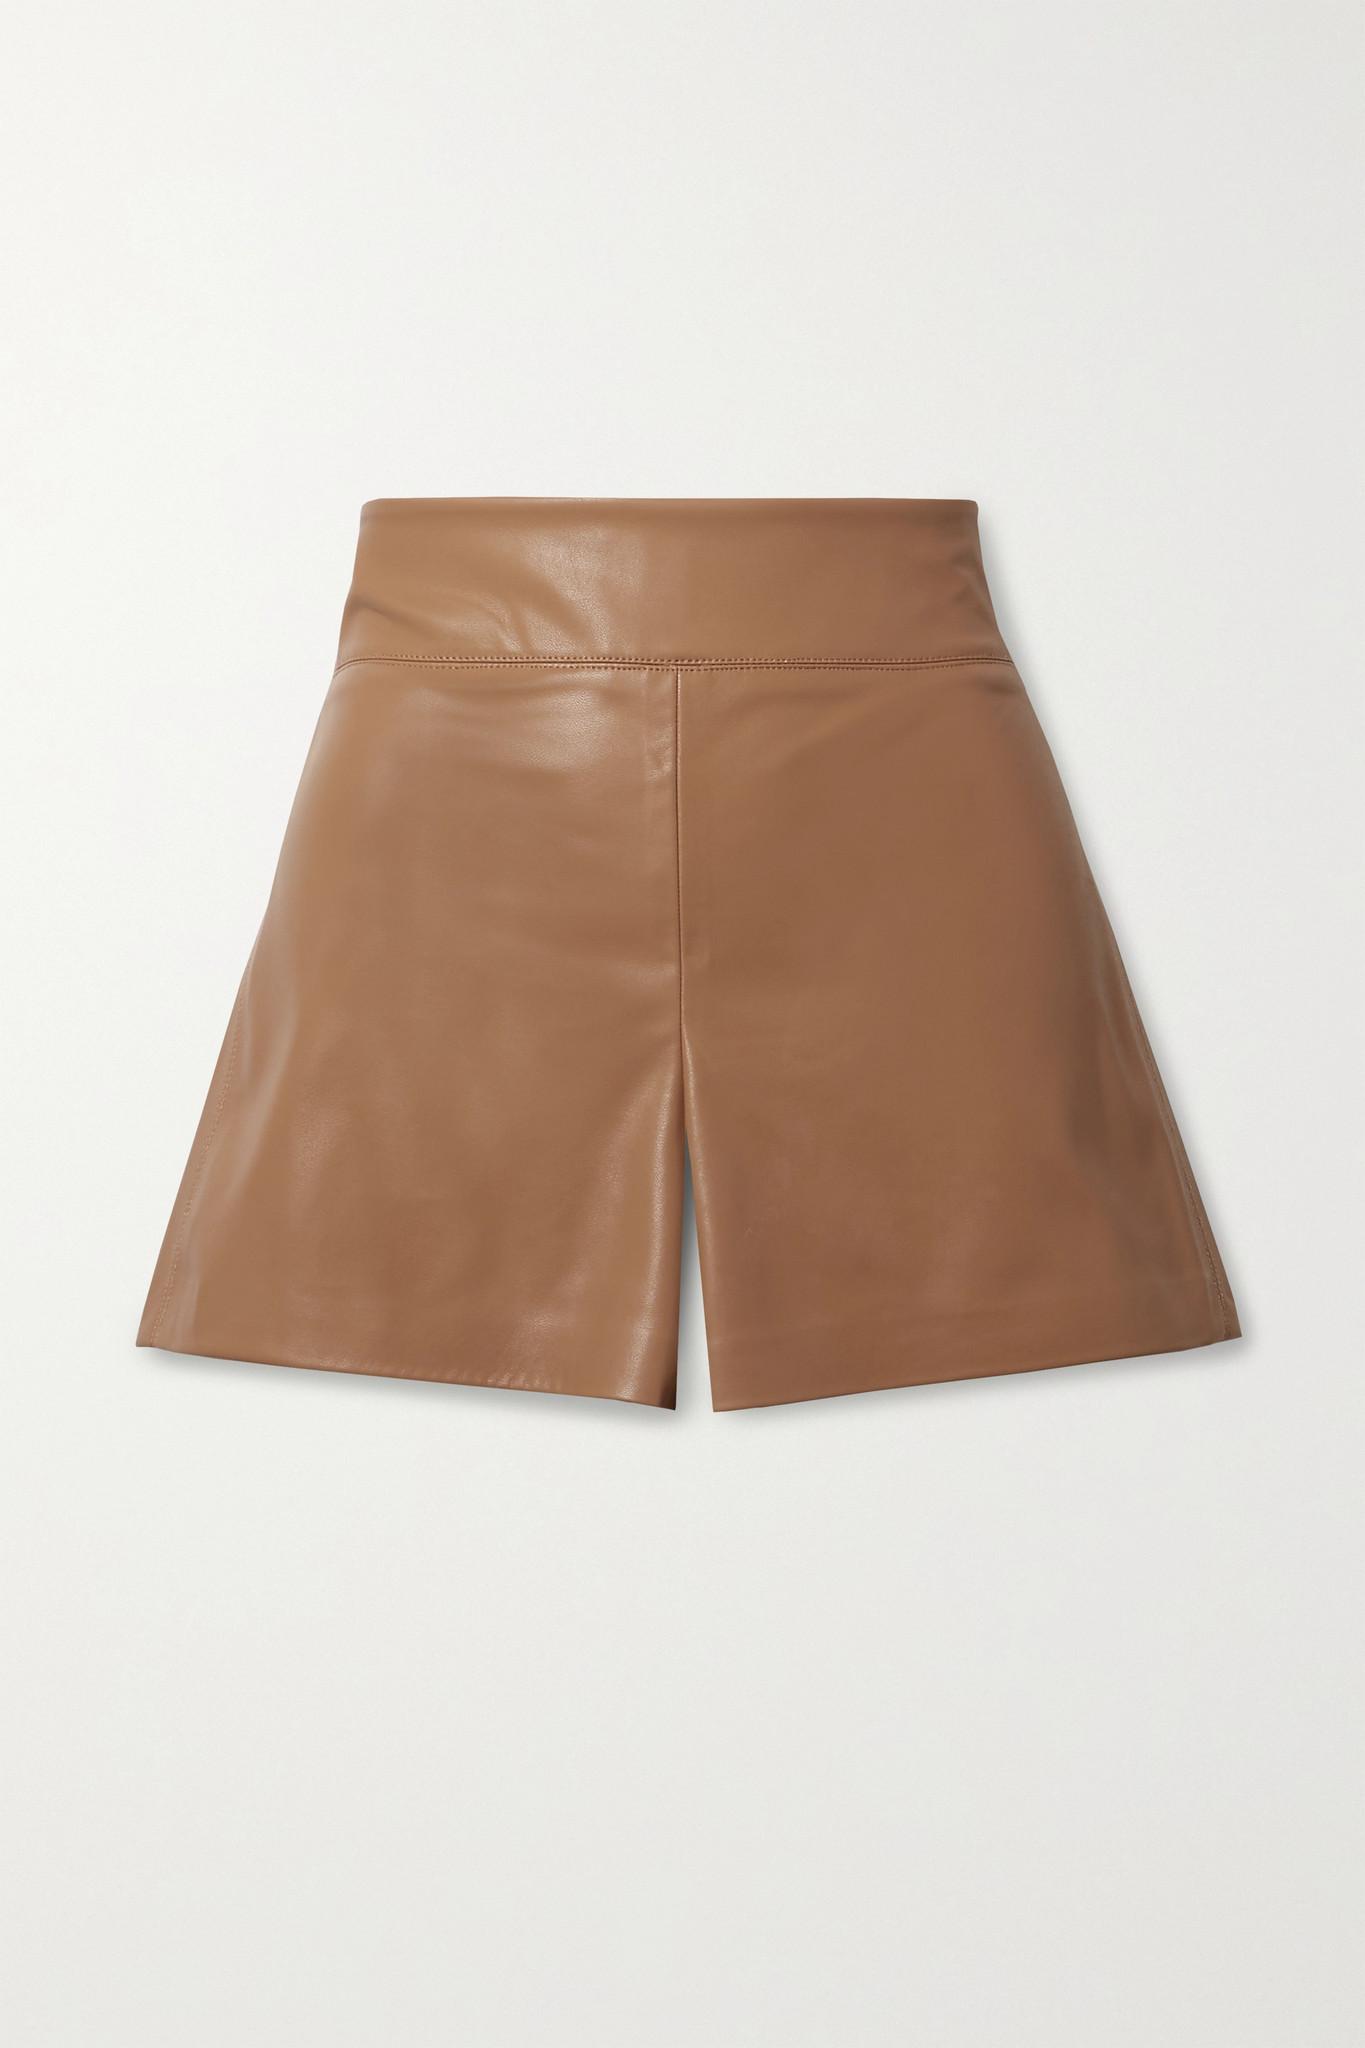 ALICE + OLIVIA - Donald Vegan Stretch-leather Shorts - Brown - US12